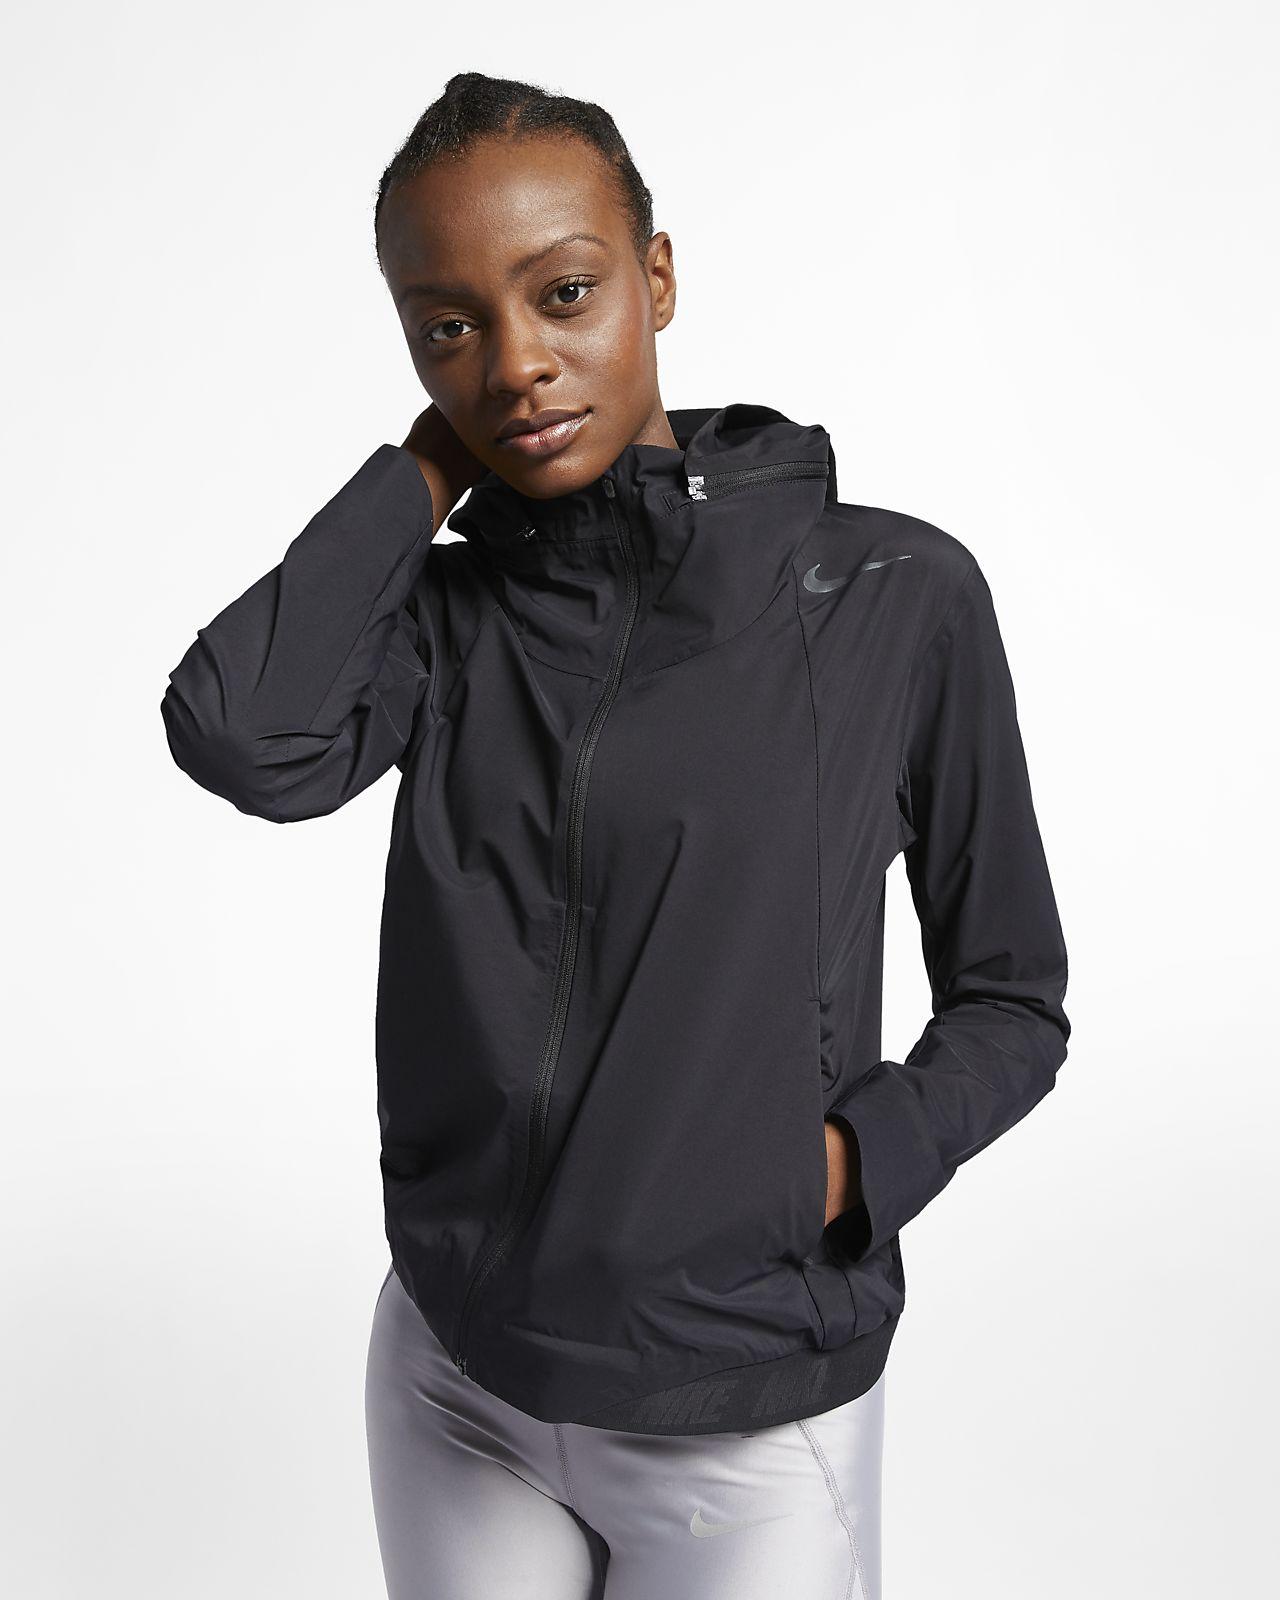 detailed look 0271b 0ce6c ... Nike Zonal AeroShield Women s Running Jacket